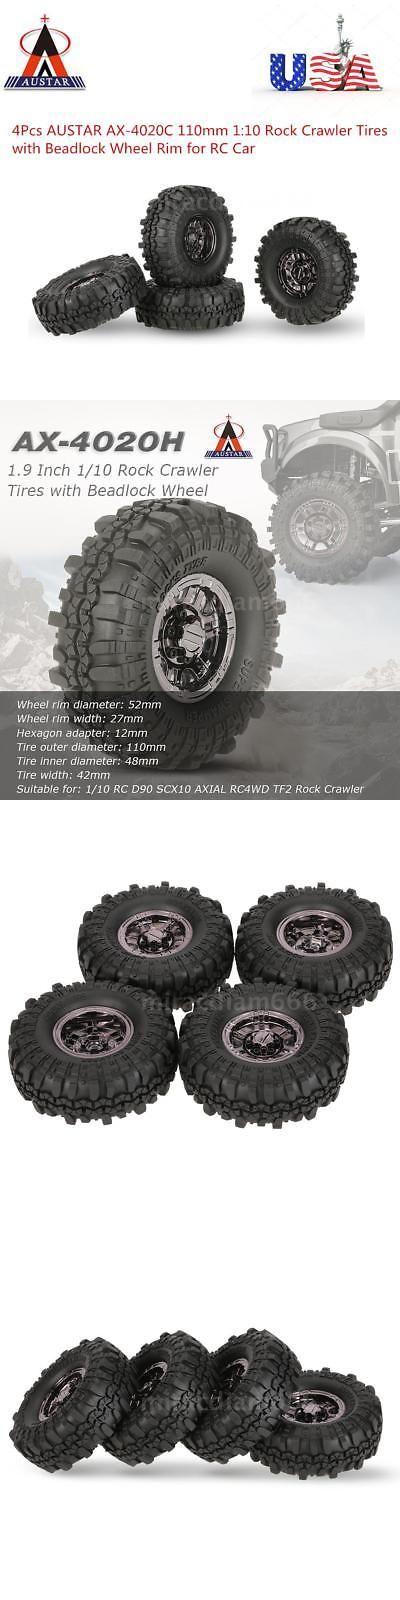 4X 1.9 Inch Wheel Hub Beadlock Wheel Rim for 1:10 RC Rock Crawler SCX10 D90 LO